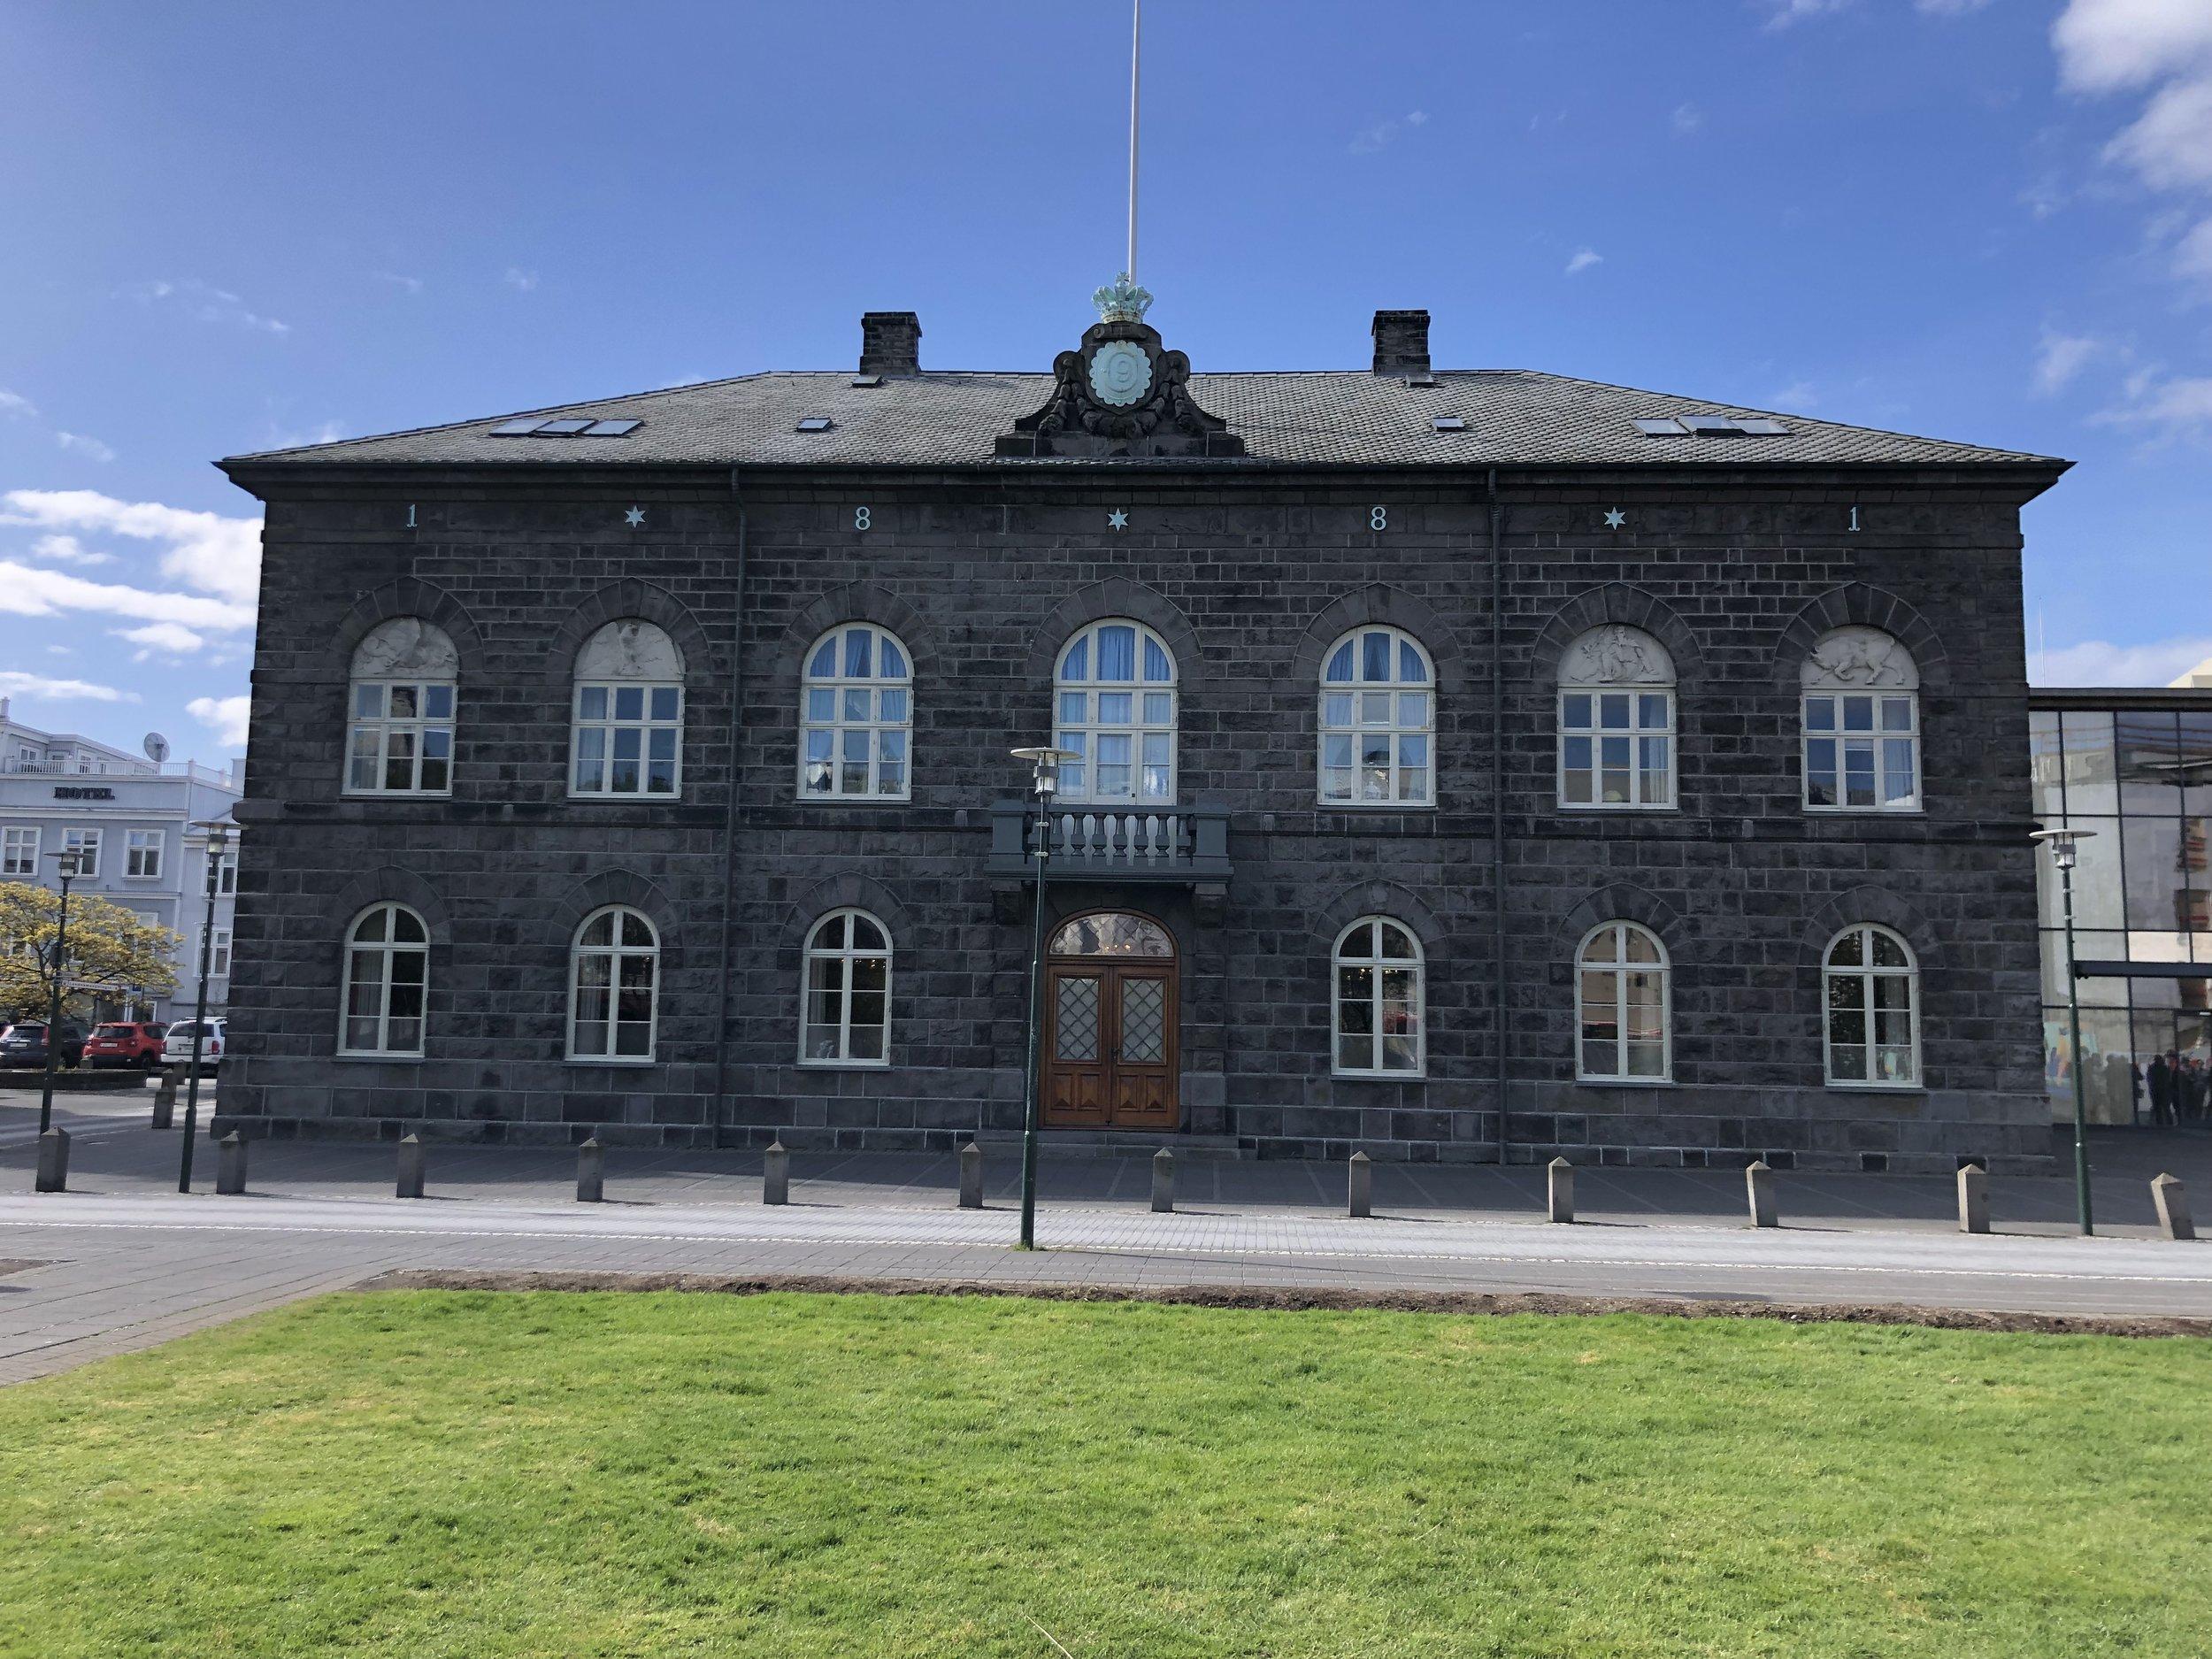 Icelandic parliament building in Reykjavik.